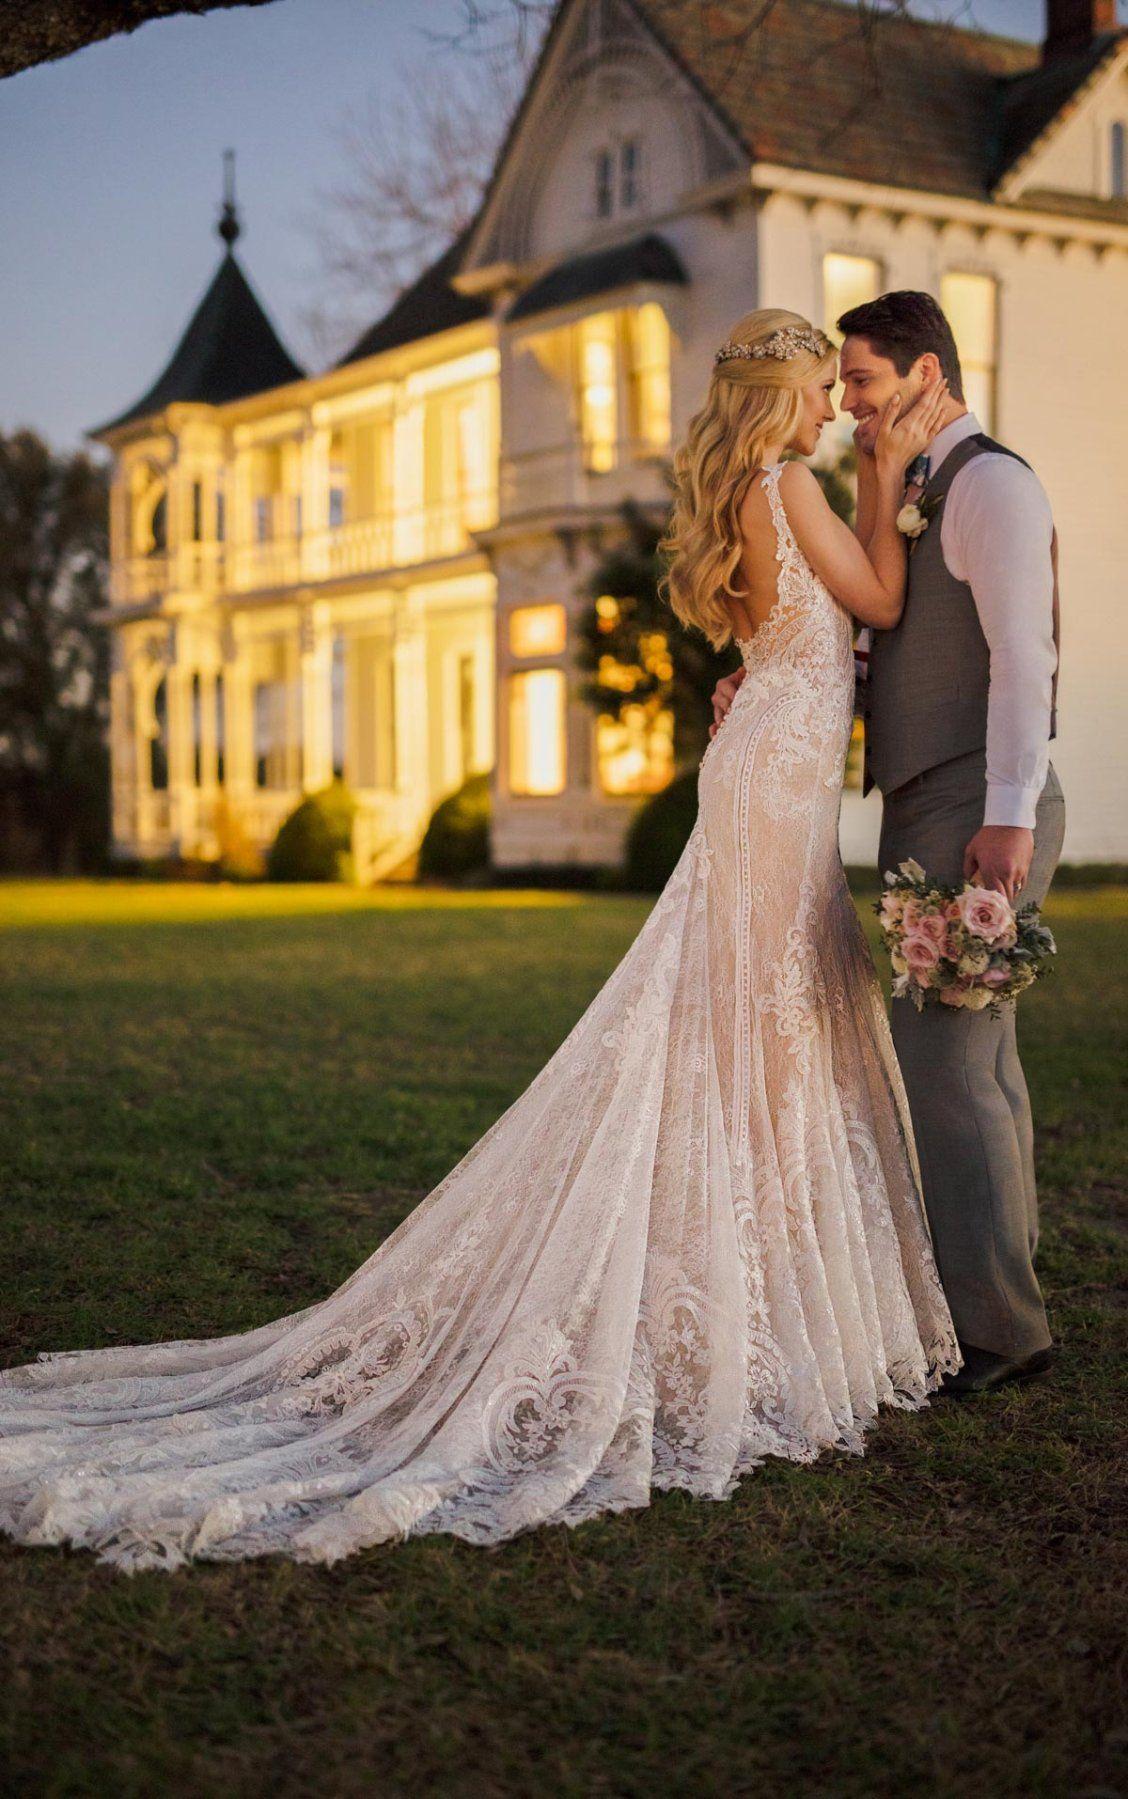 Designer wedding dresses traditional wedding dresses wedding